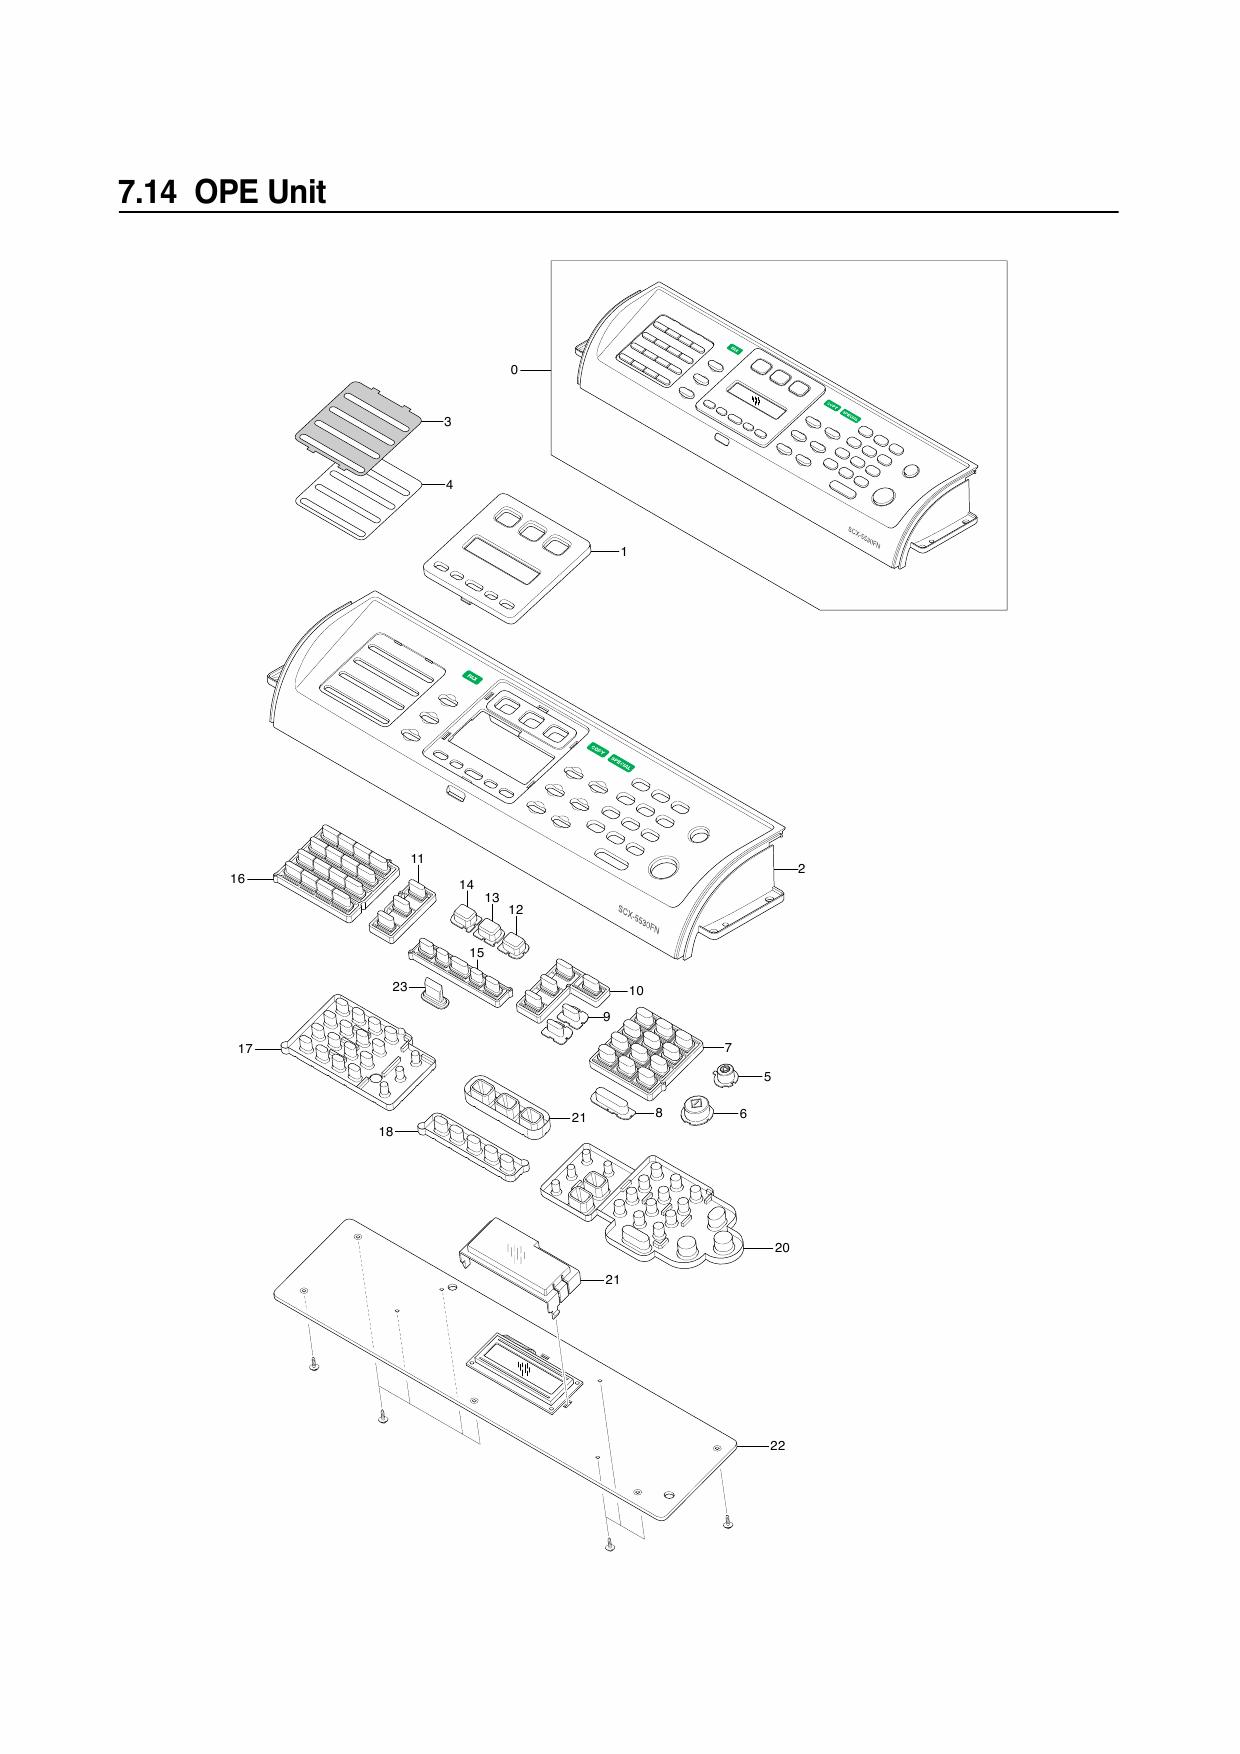 Samsung Digital-Laser-MFP SCX-5330 Parts Manual